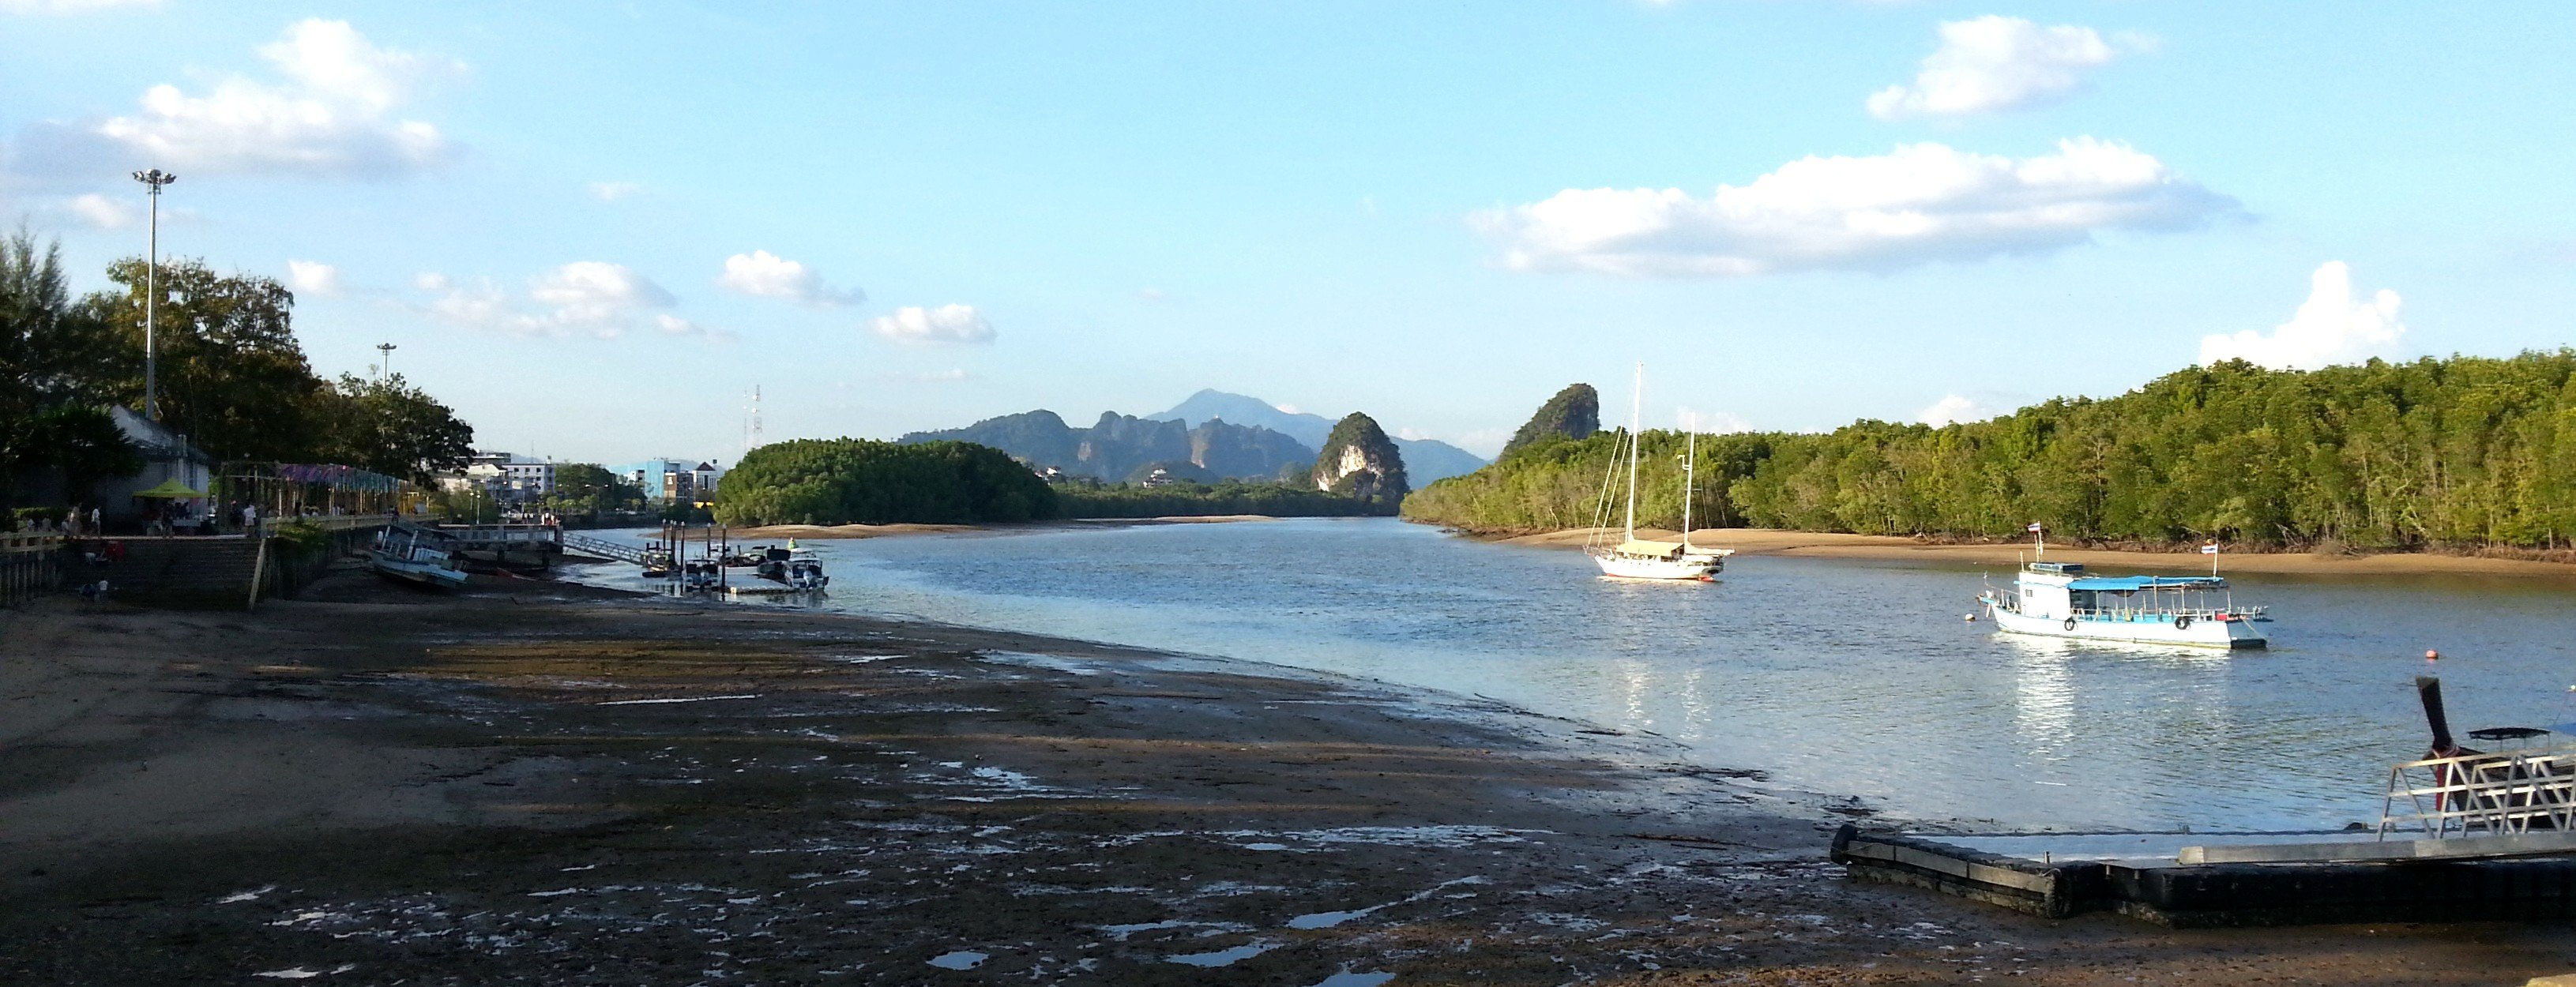 River front in Krabi Town